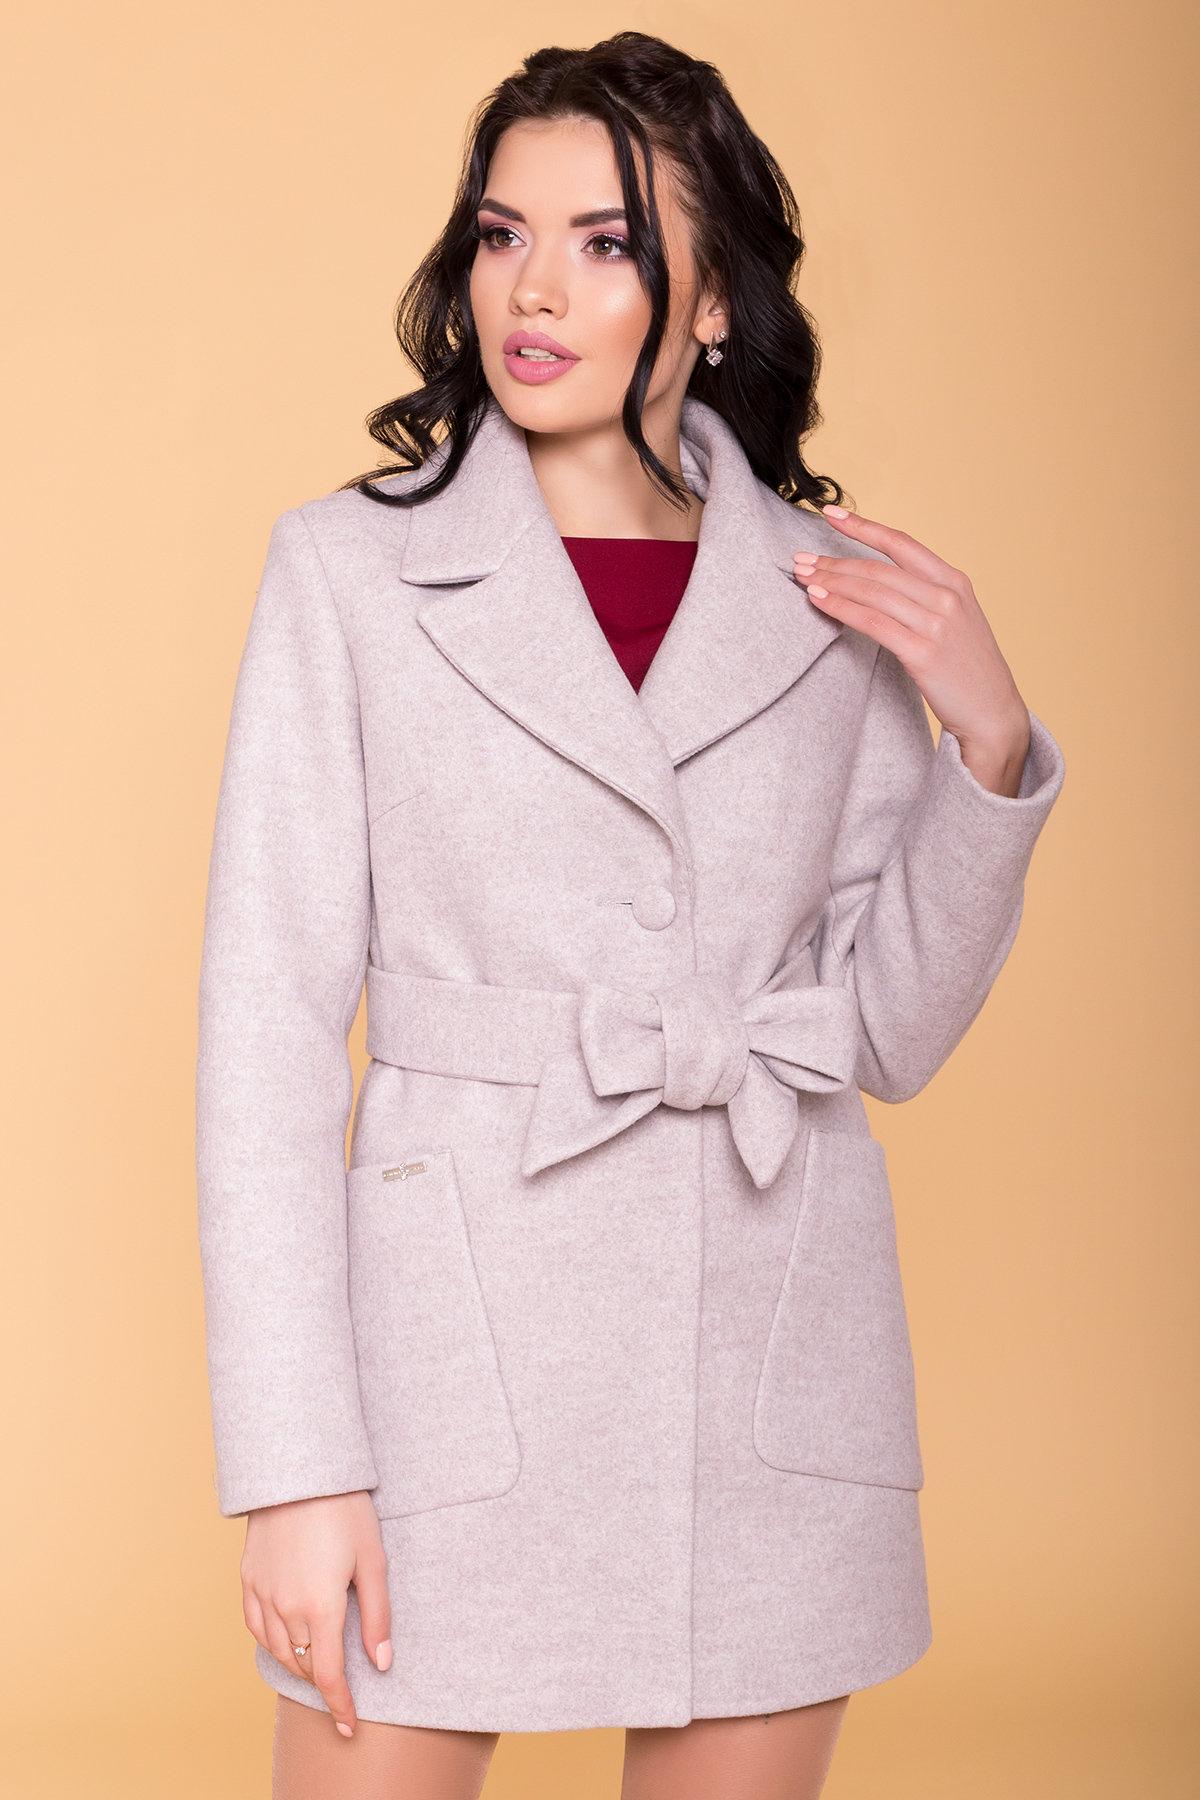 Пальто Кидмон 6220 АРТ. 41251 Цвет: Серо-бежевый 19 - фото 5, интернет магазин tm-modus.ru